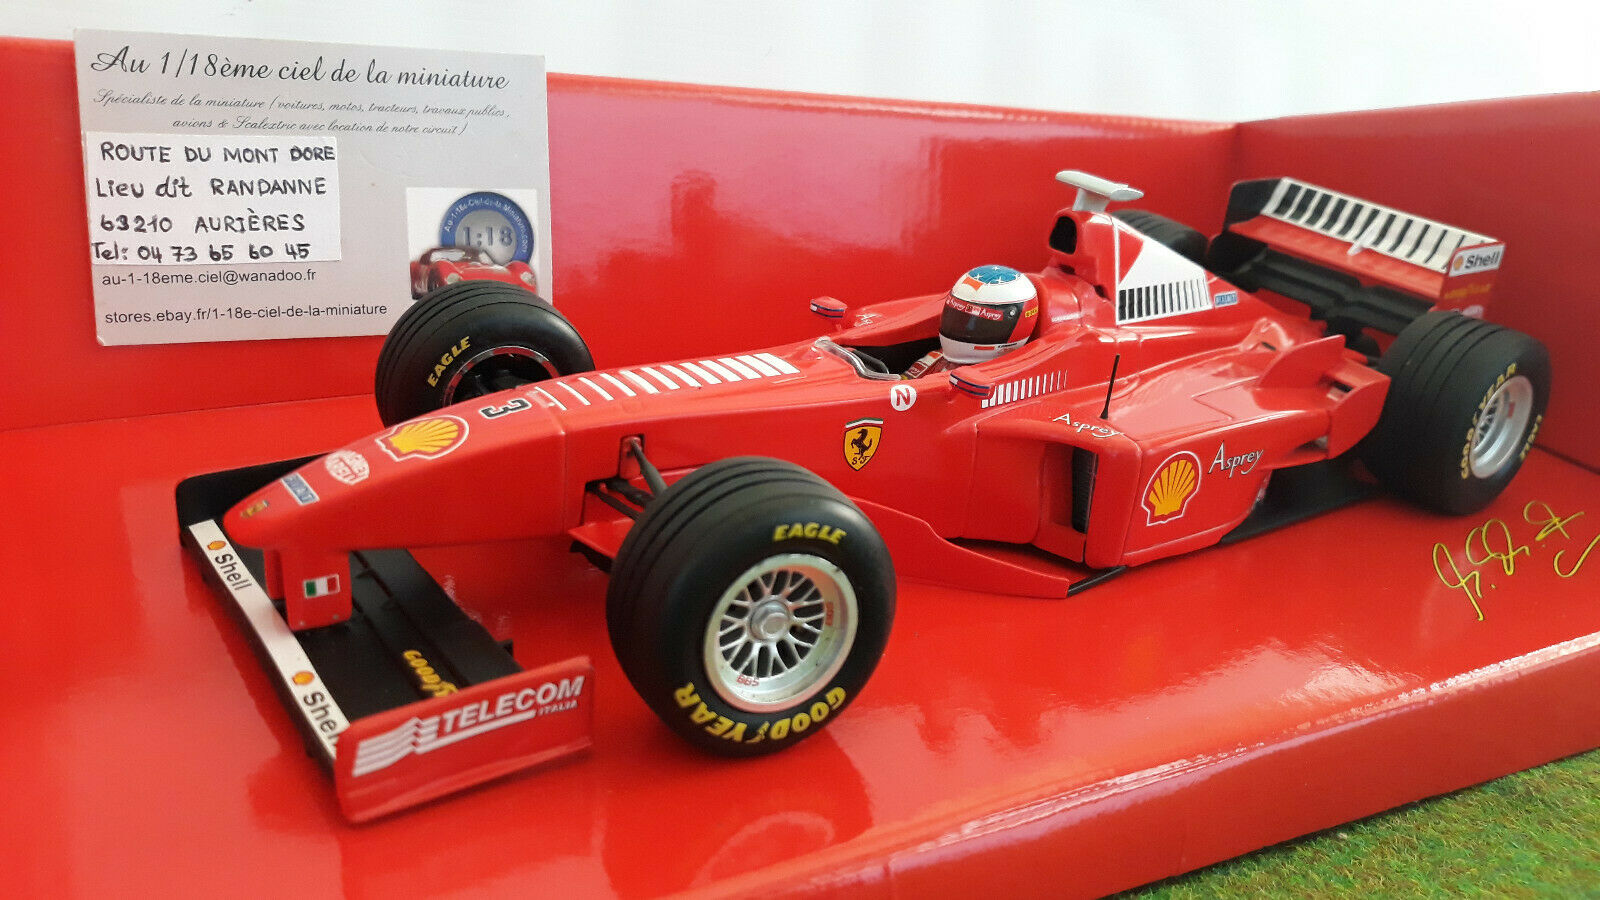 F1 FERRARI 1998 F 300   3 formule 1 SCHUMACHER 1 18 MINICHAMPS 510981803 voiture